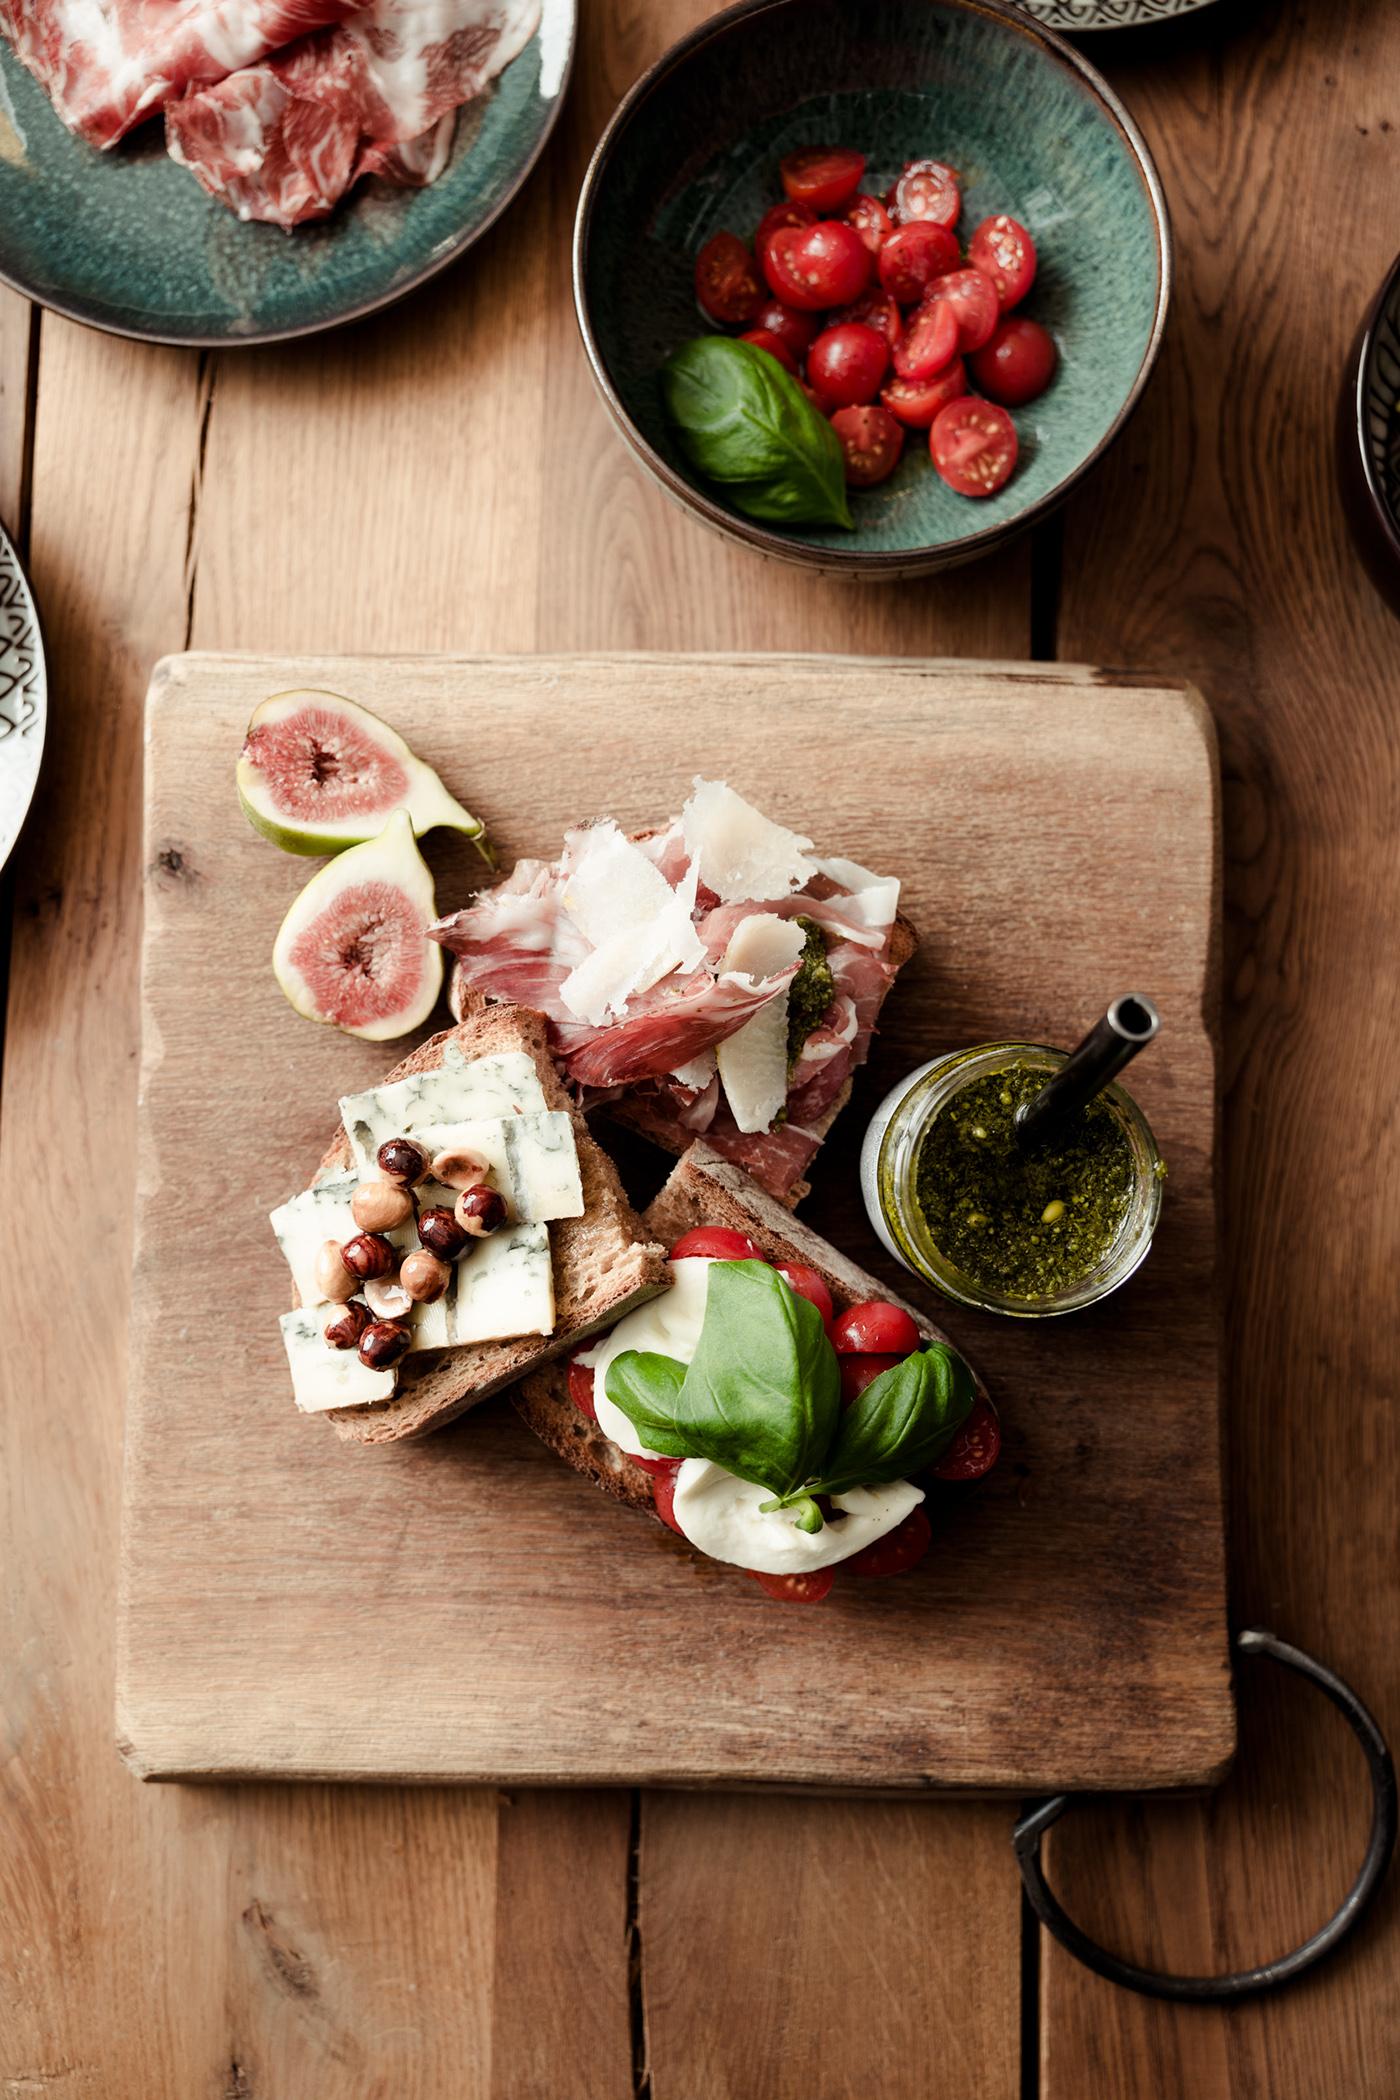 Adobe Portfolio Food  foodphotography Ineriors Scandinavian norway The Nest